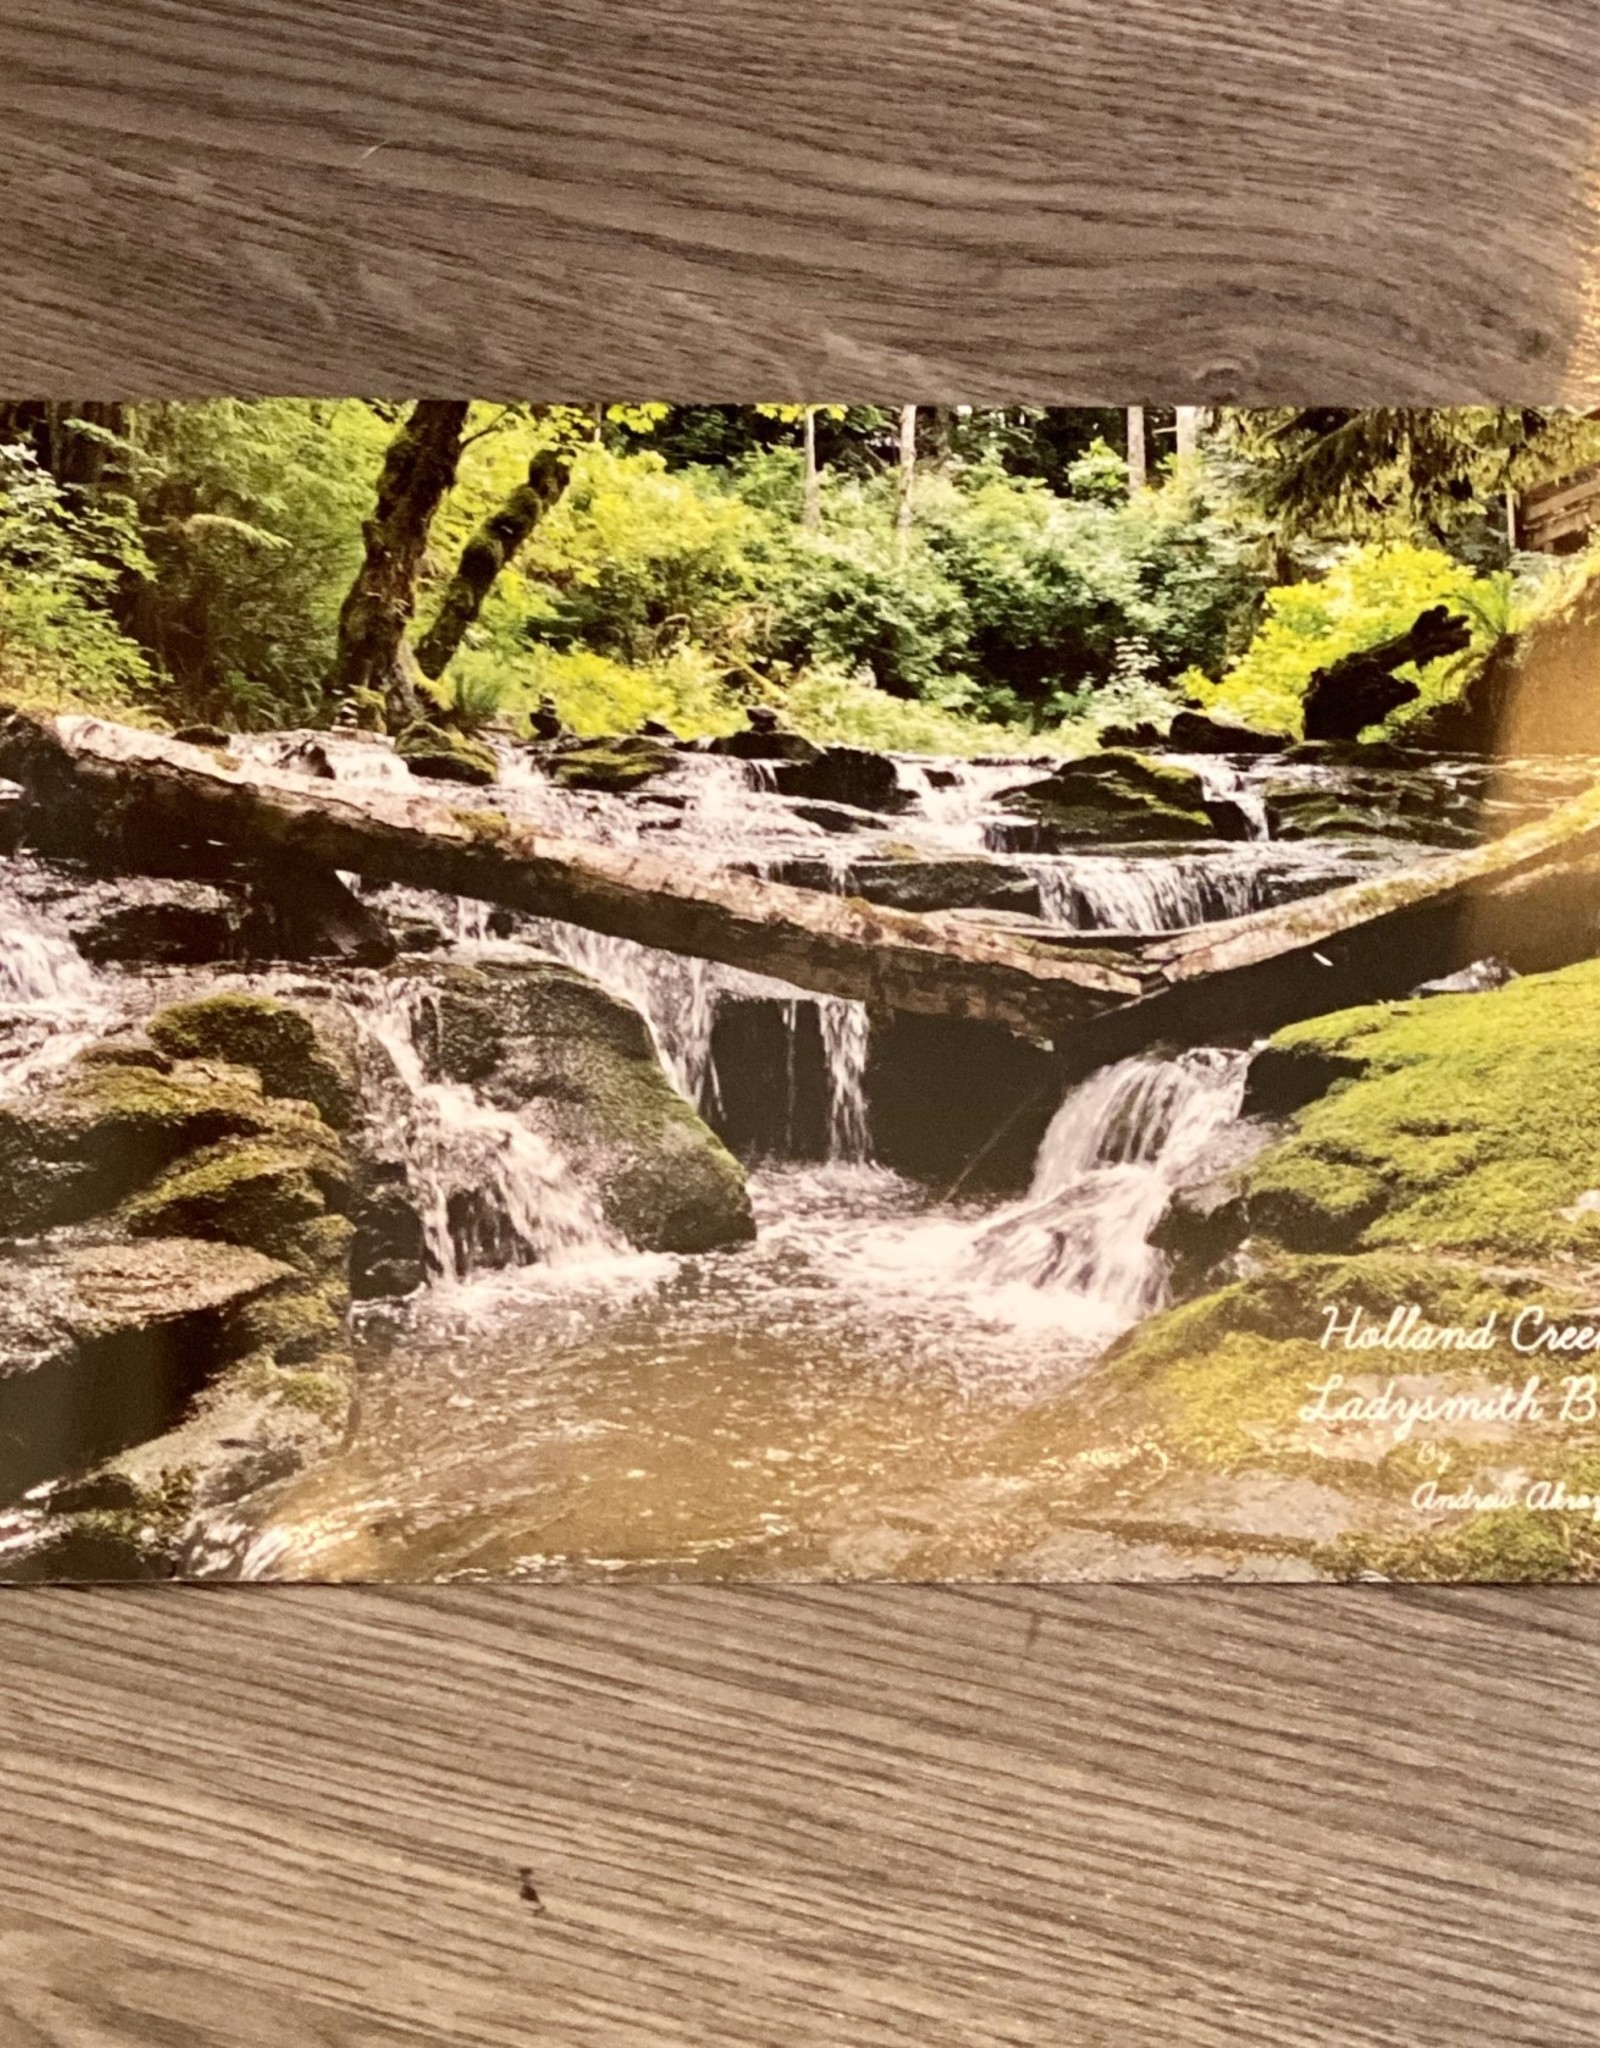 Post Card - Holland Creek